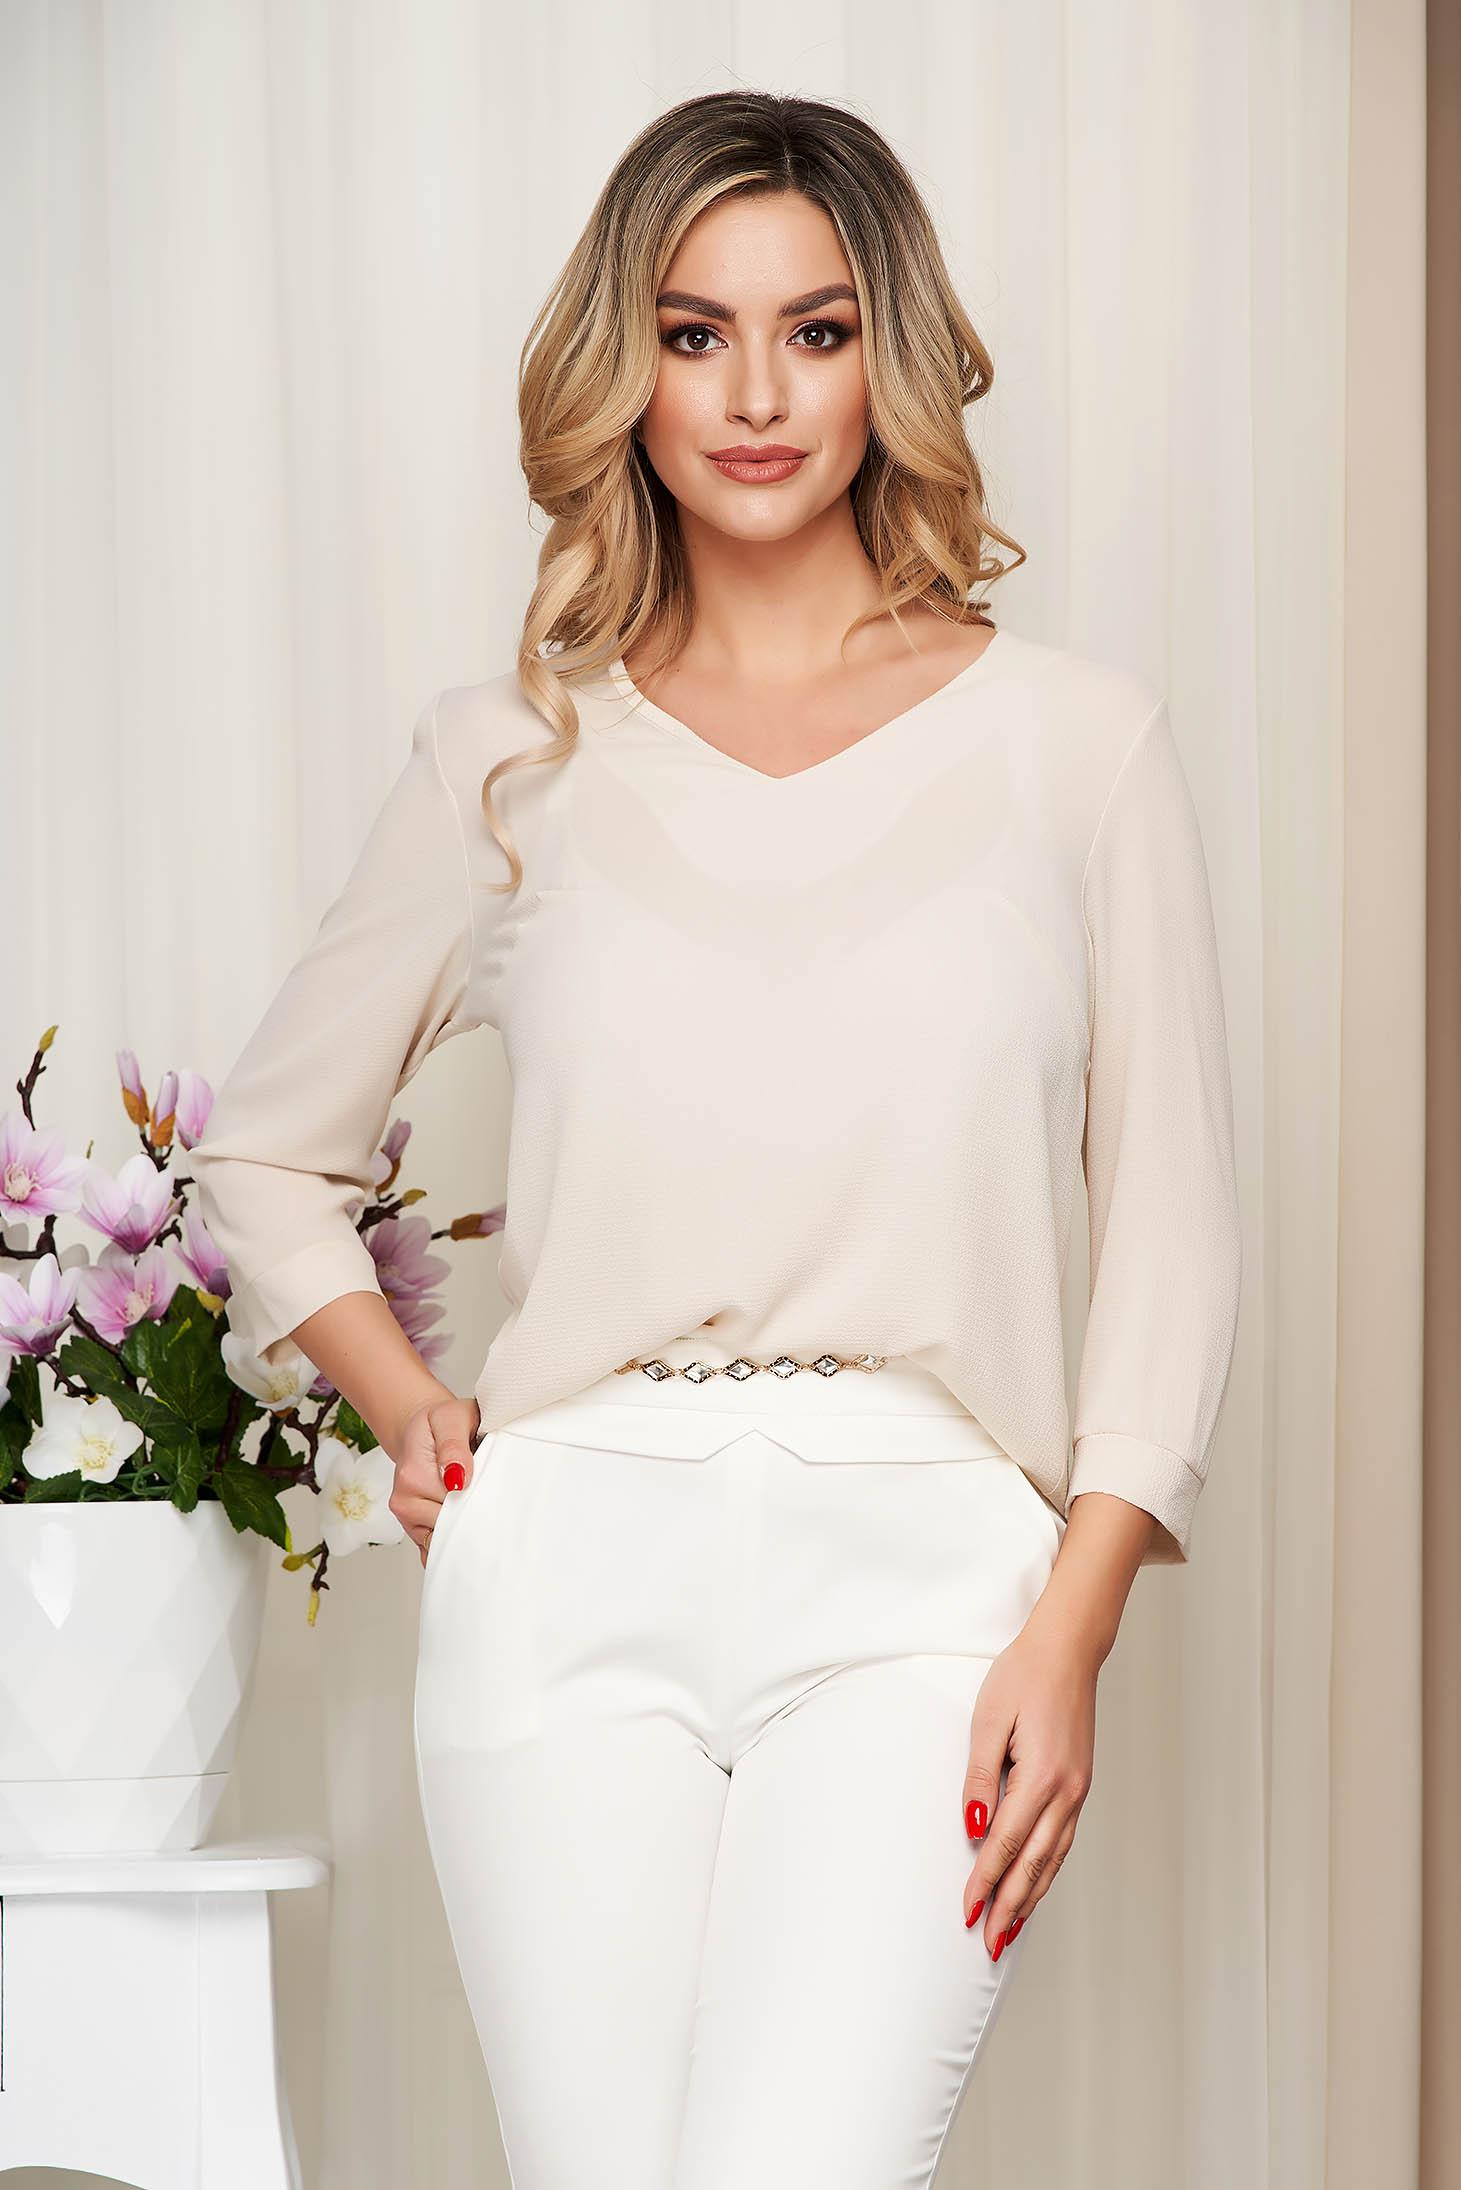 Women`s blouse cream loose fit thin fabric slightly transparent fabric